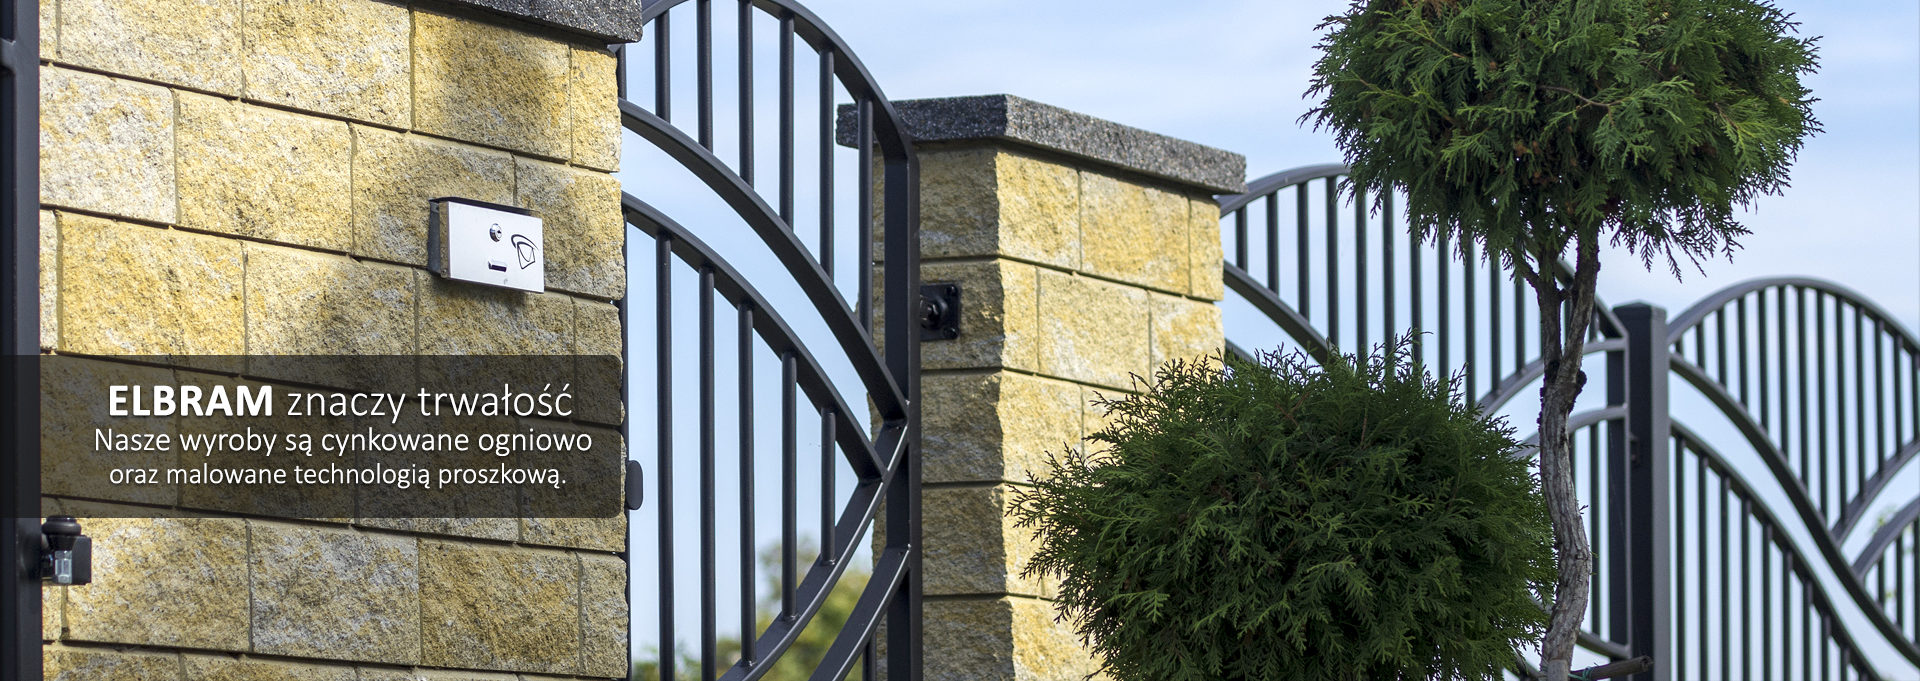 elbram jan guzik, bramy, ogrodzenia, balustrady, metaloplastyka